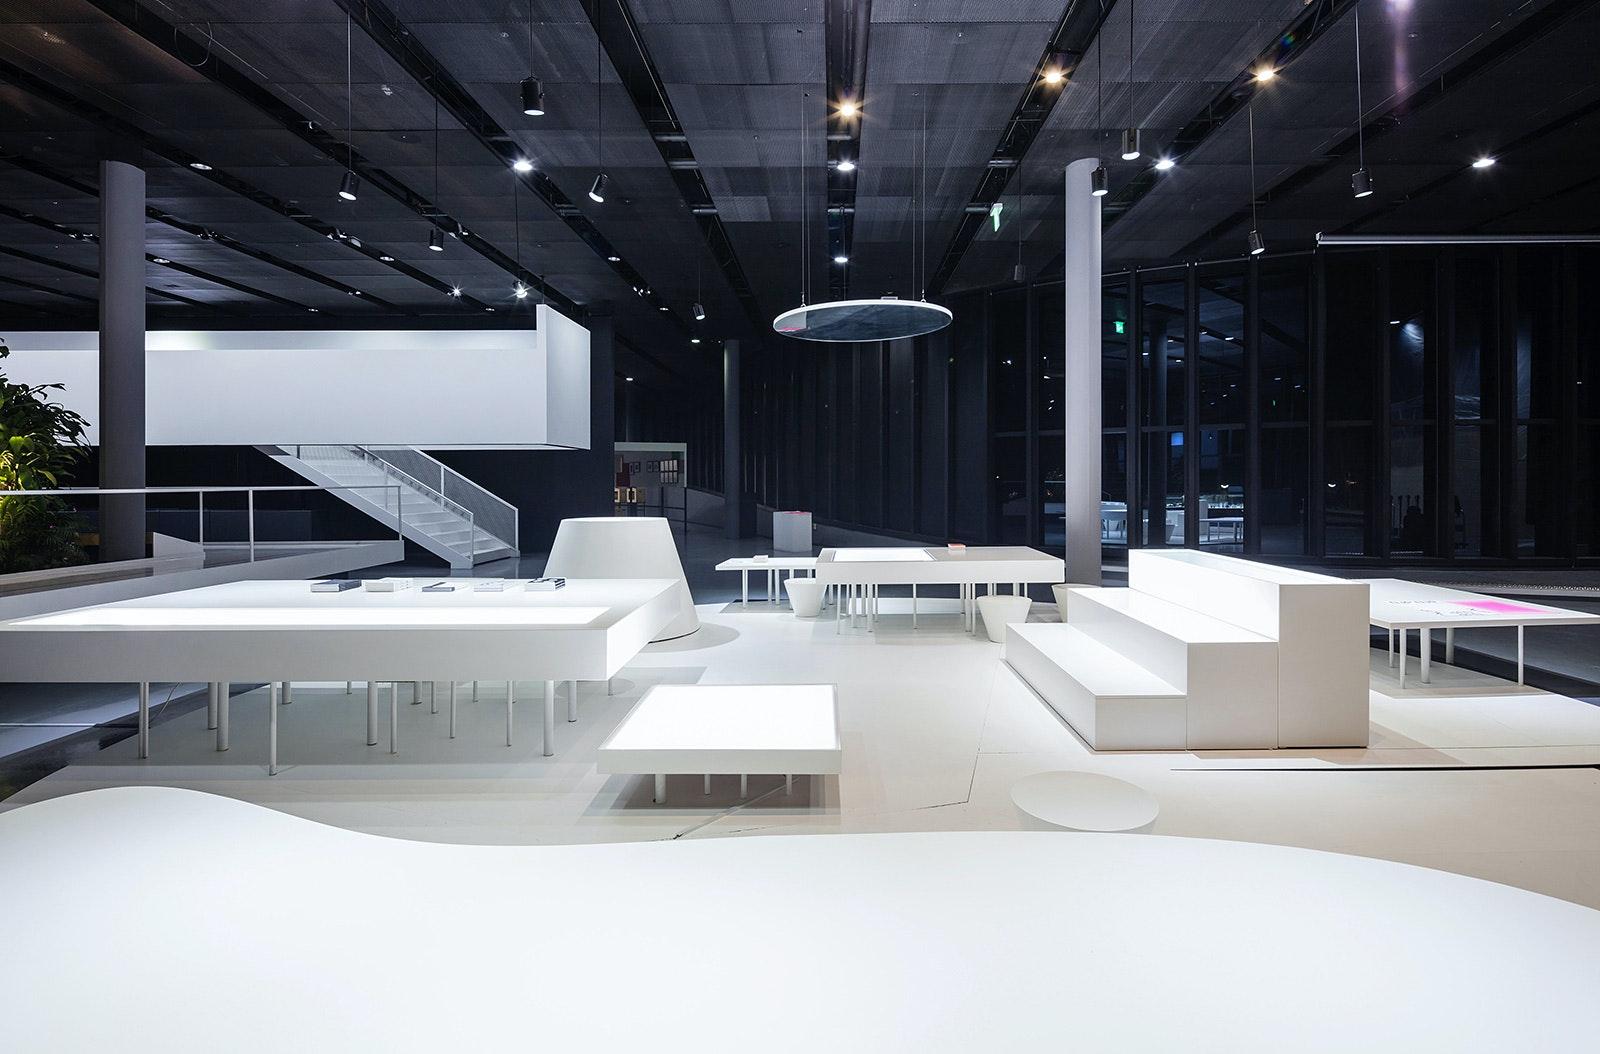 Architect n h d m nahyun hwang david eugin moon architect of record alab architects photo courtesy of nam june paik art center